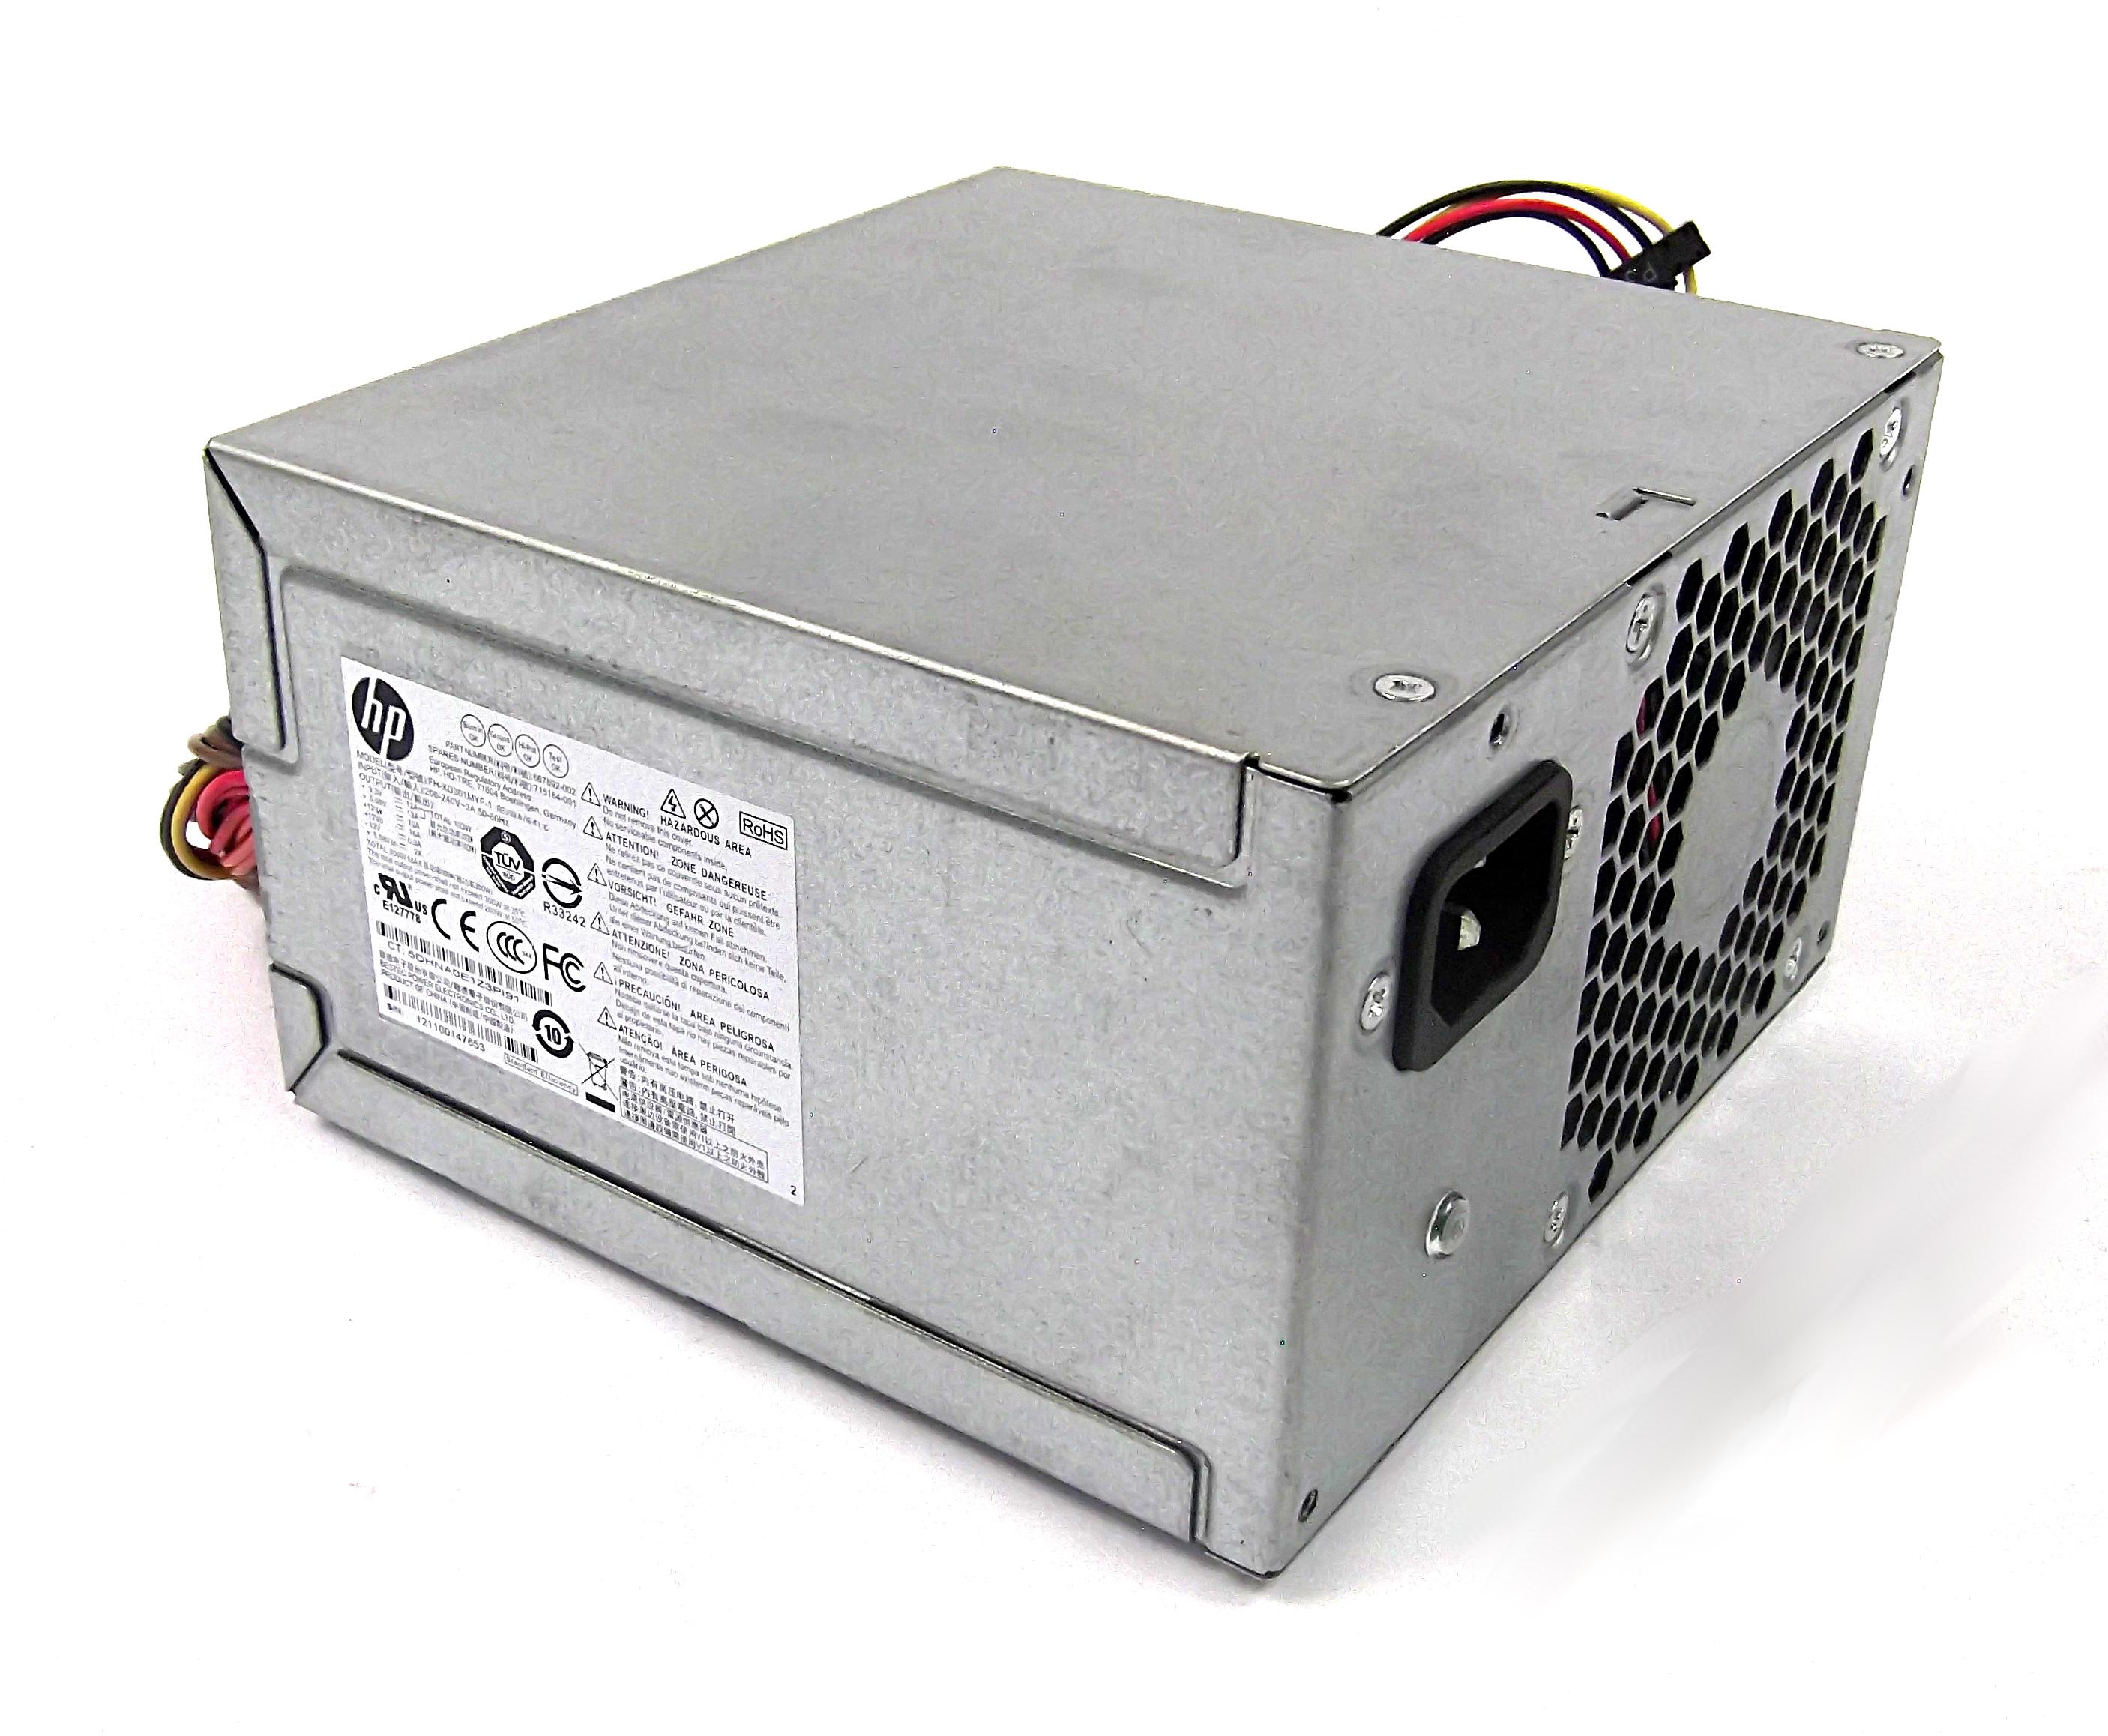 HP 715184-001 Bestec FH-XD301MYF-1 300W ATX 24 Pin PSU - 667892-001